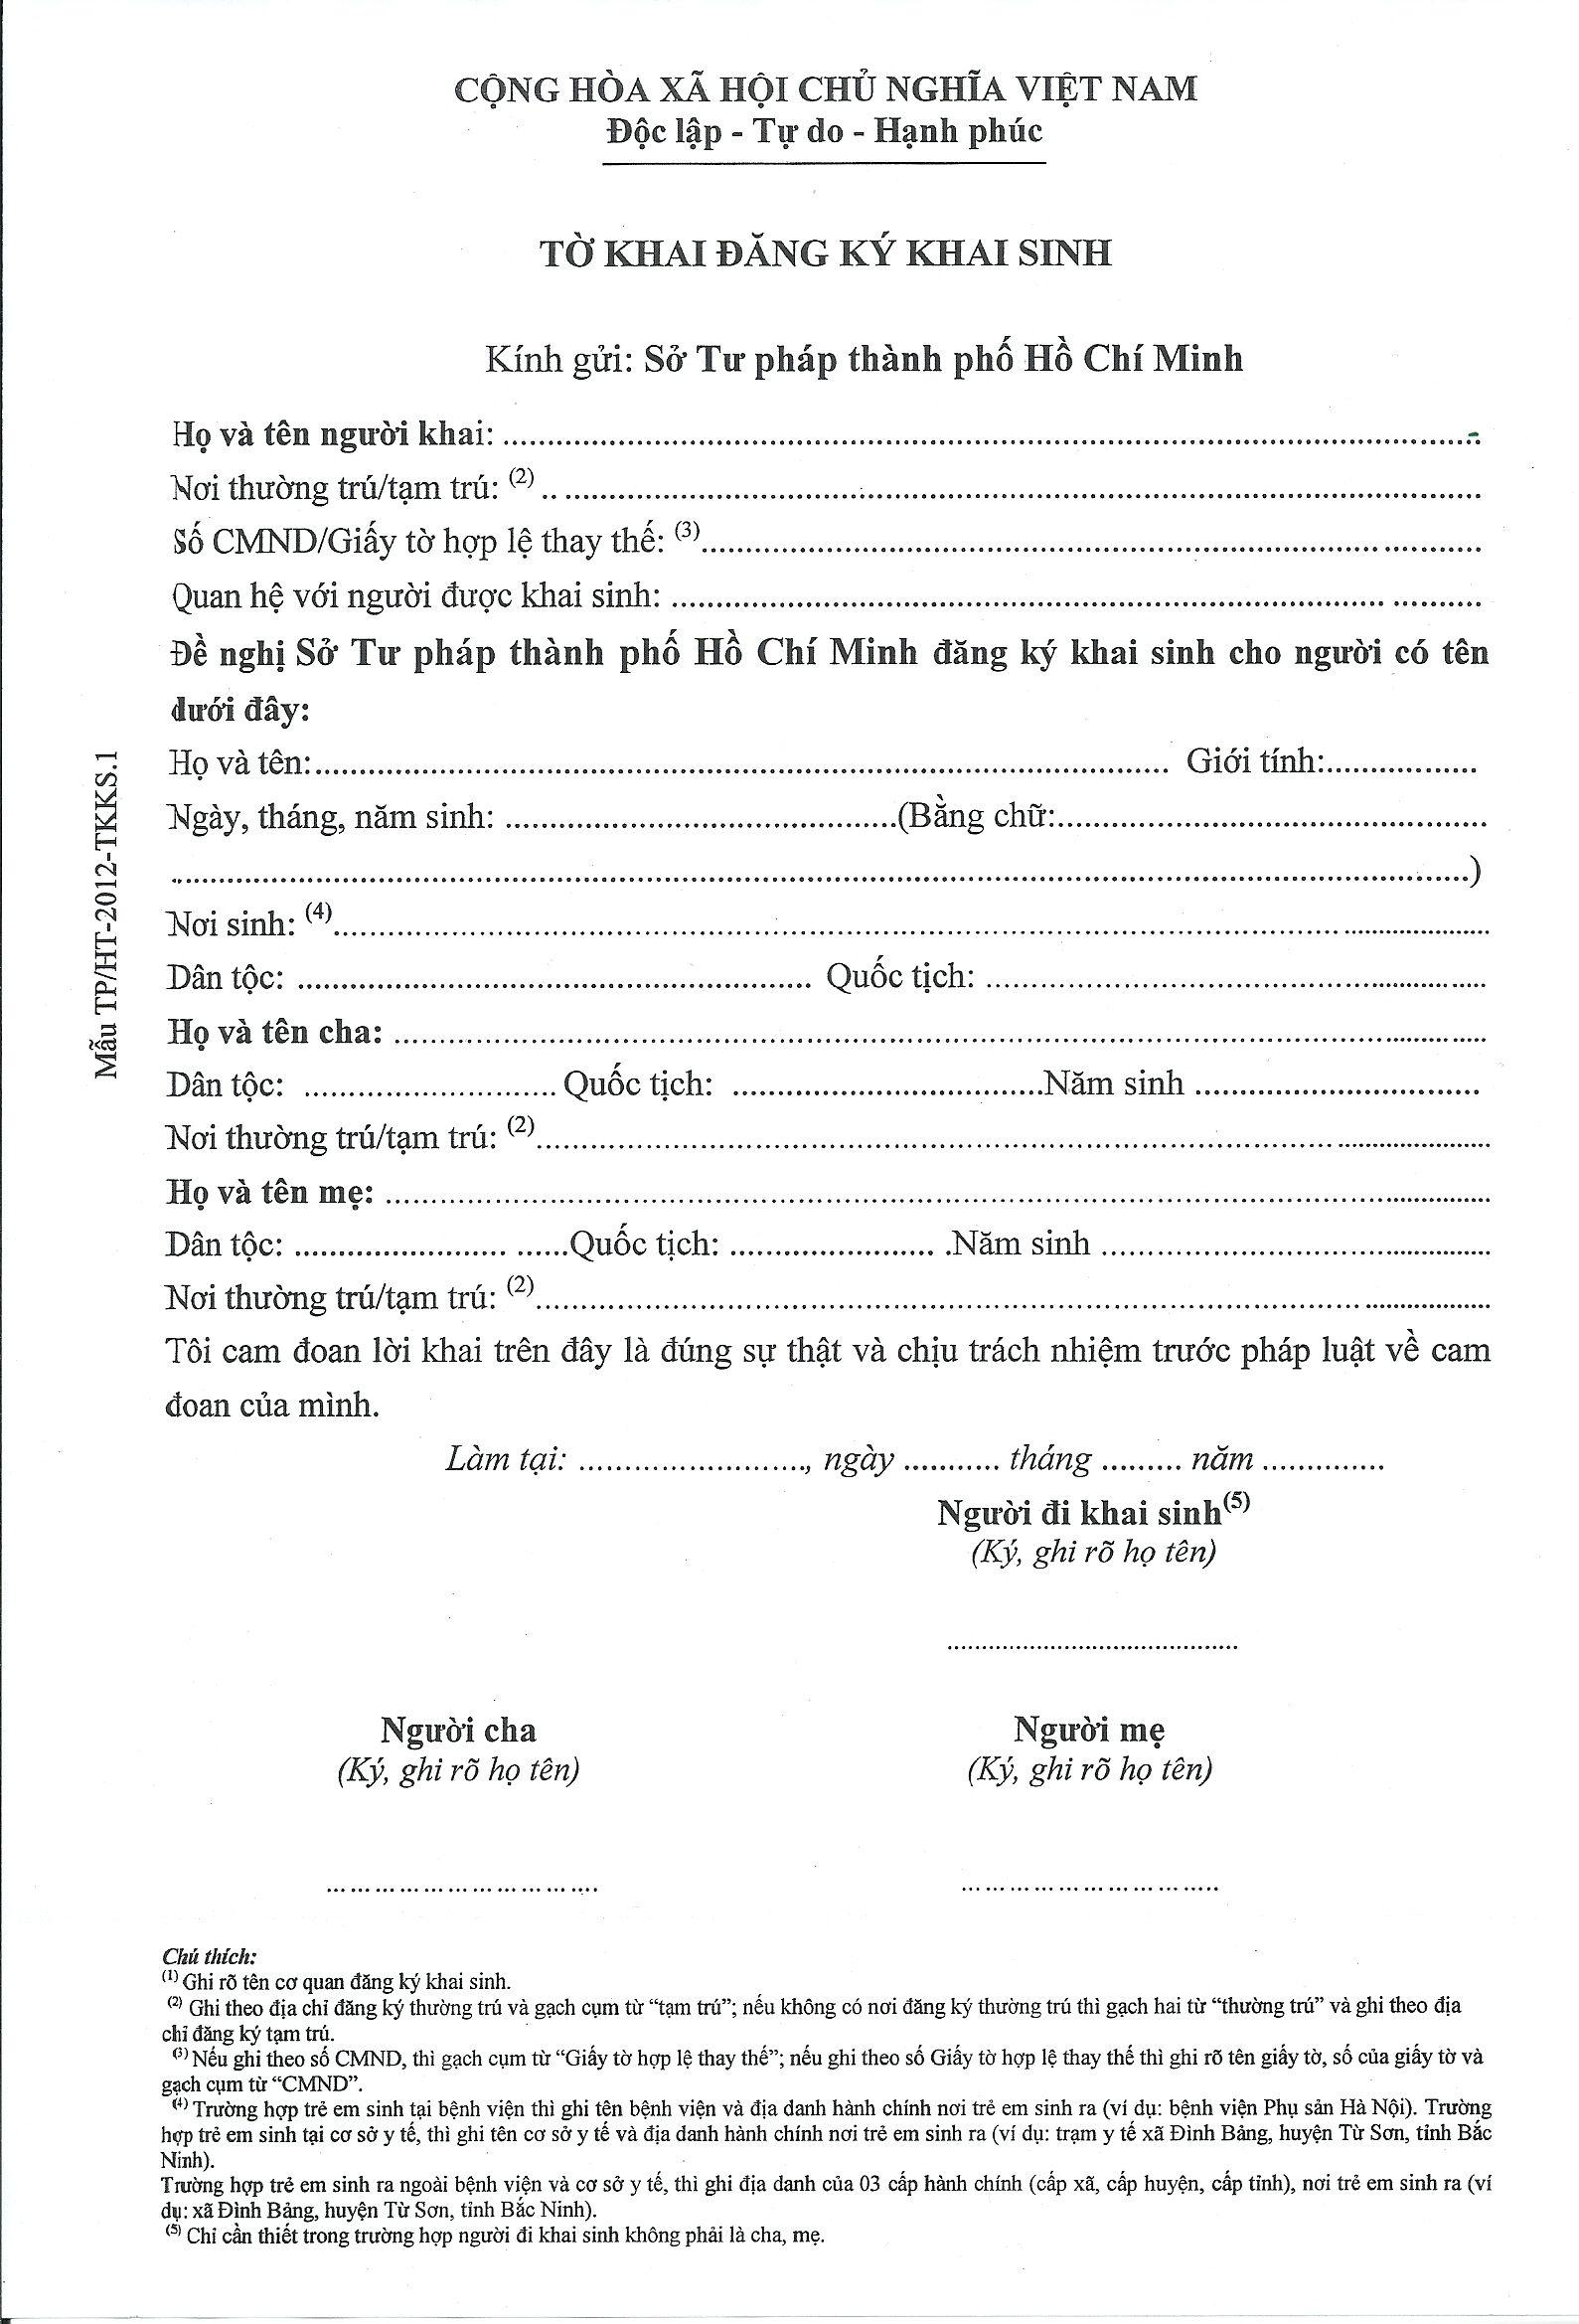 How get birth certificate vietnam summary hello saigon affidavit how get birth certificate vietnam summary hello saigon affidavit that the person father passport same marriage xflitez Gallery